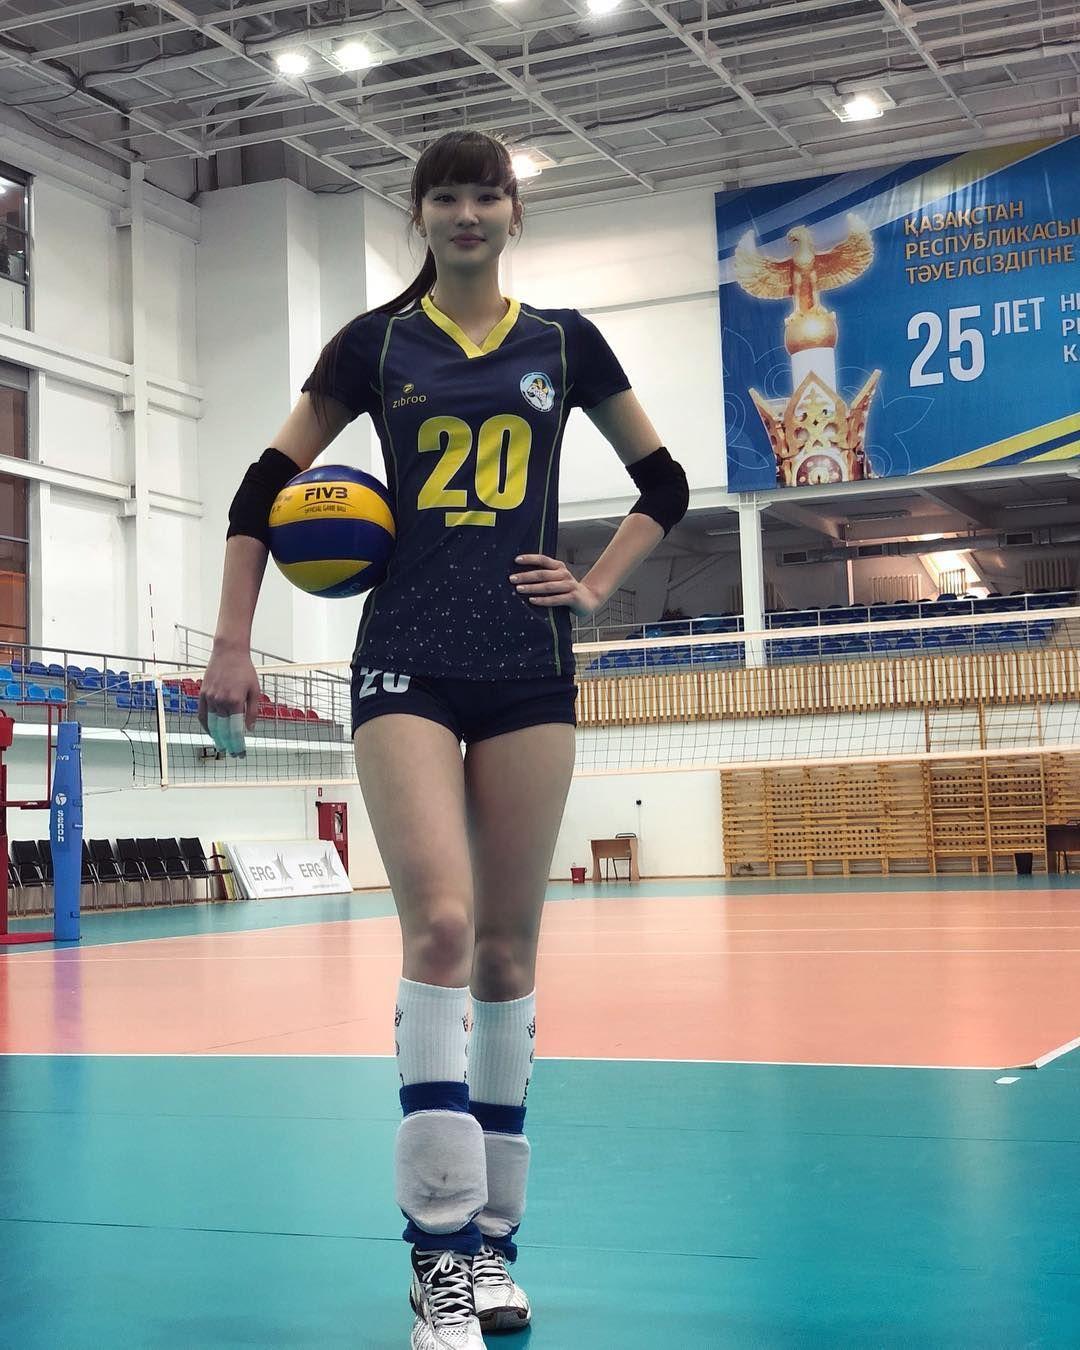 Potret Kecantikan Sabina Altynbekova Atlet Voli Putri Kazakhstan Yang Memesona Okezone Lifestyle Atlet Wanita Atlet Pemain Bola Voli